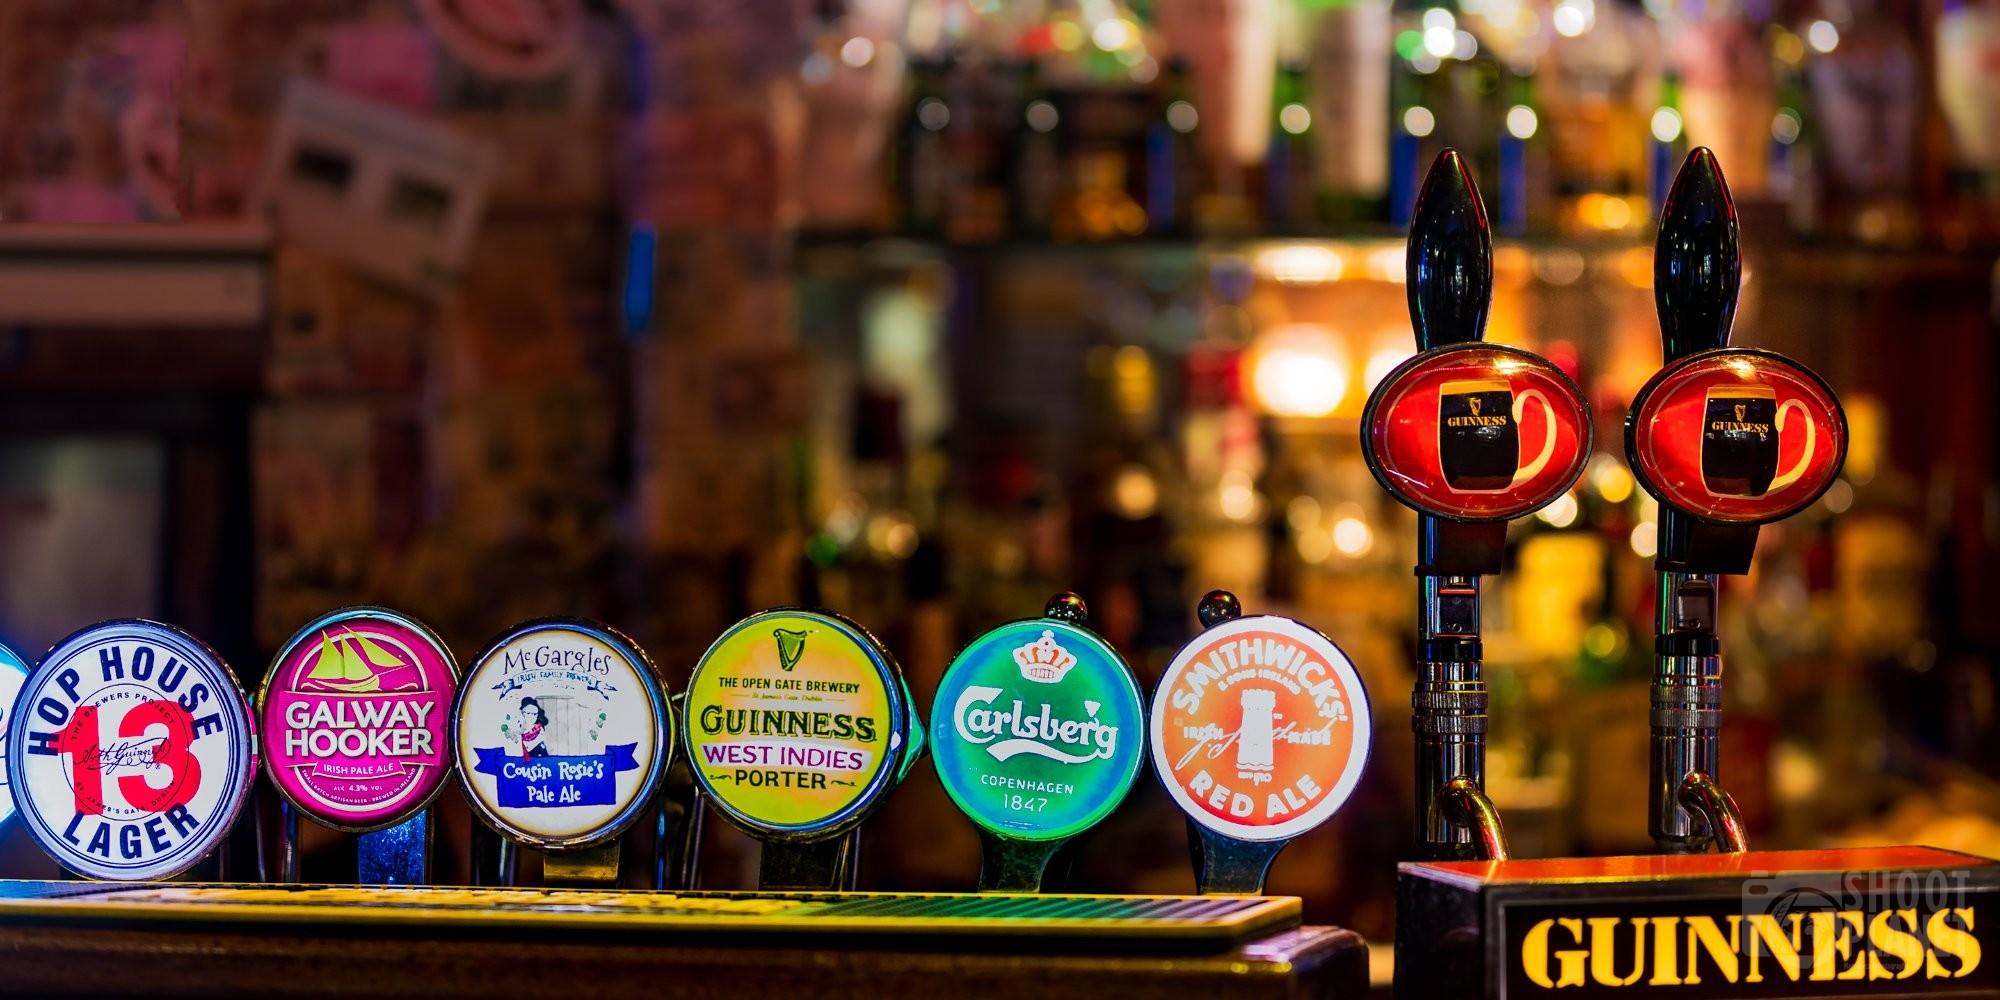 Traditional Dublin Irish pub beer tap, Ireland